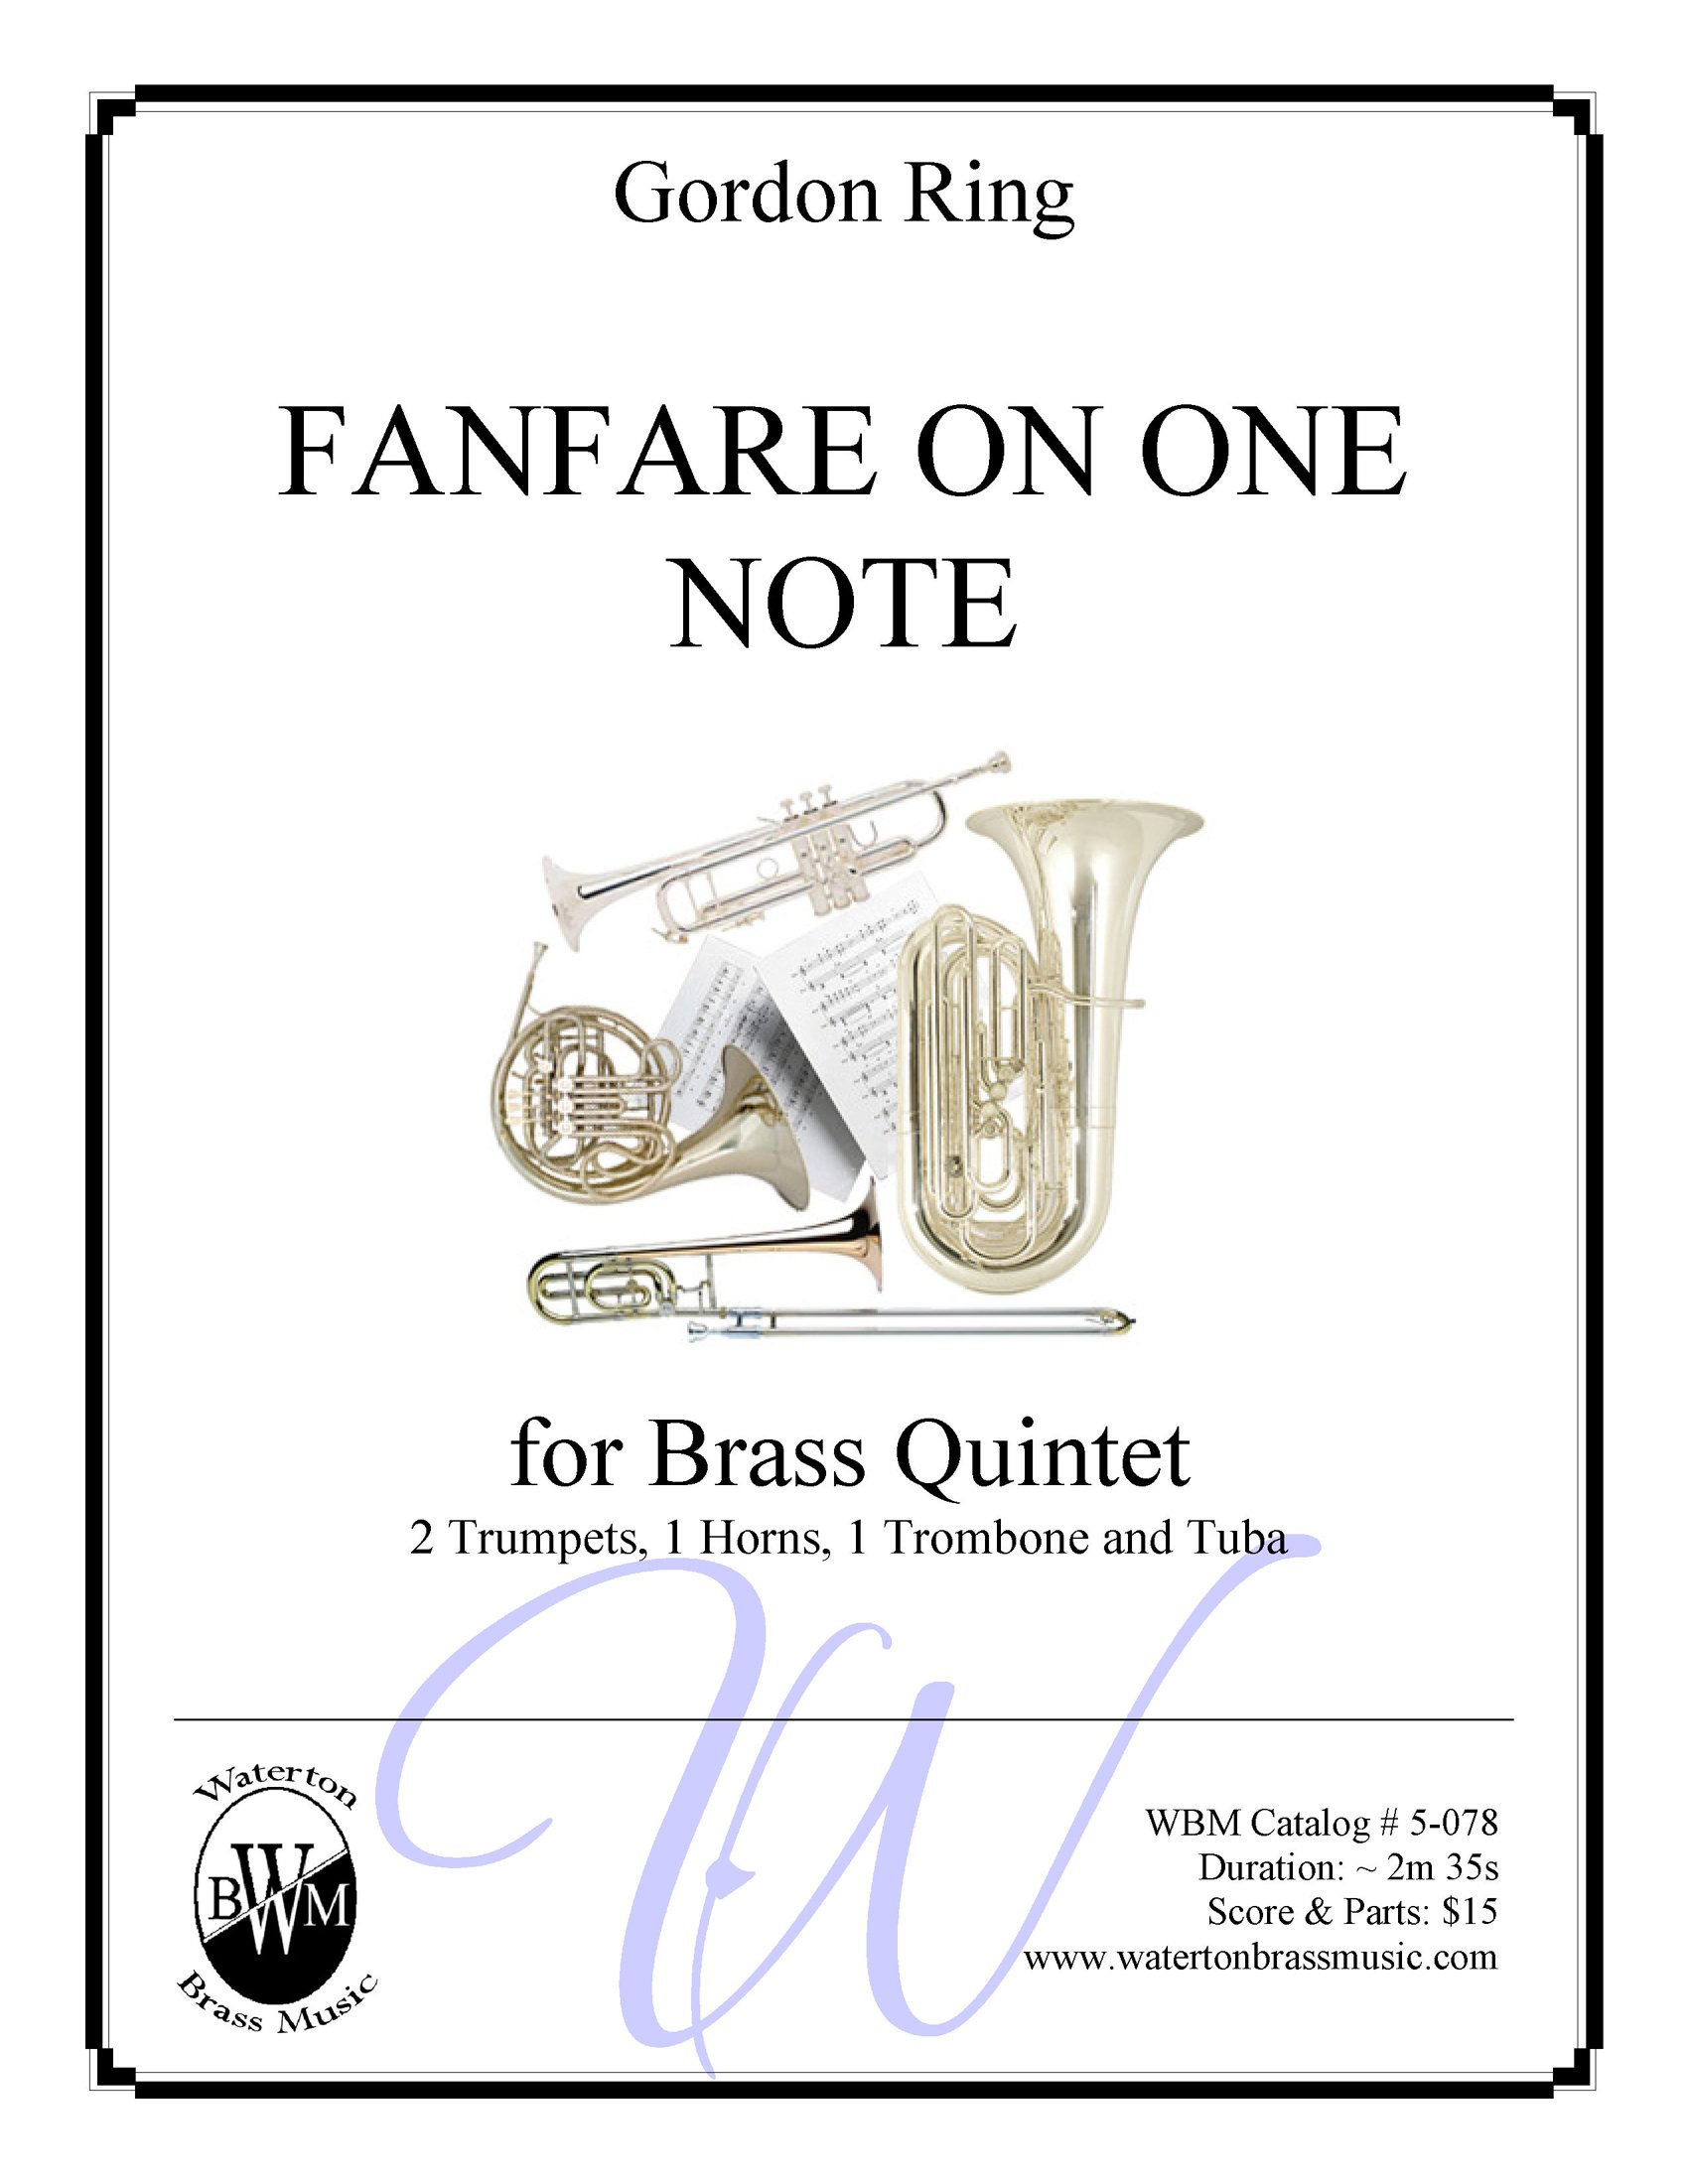 Amazon com: Fanfare On One Note - Brass Quintet Sheet Music: Gordon